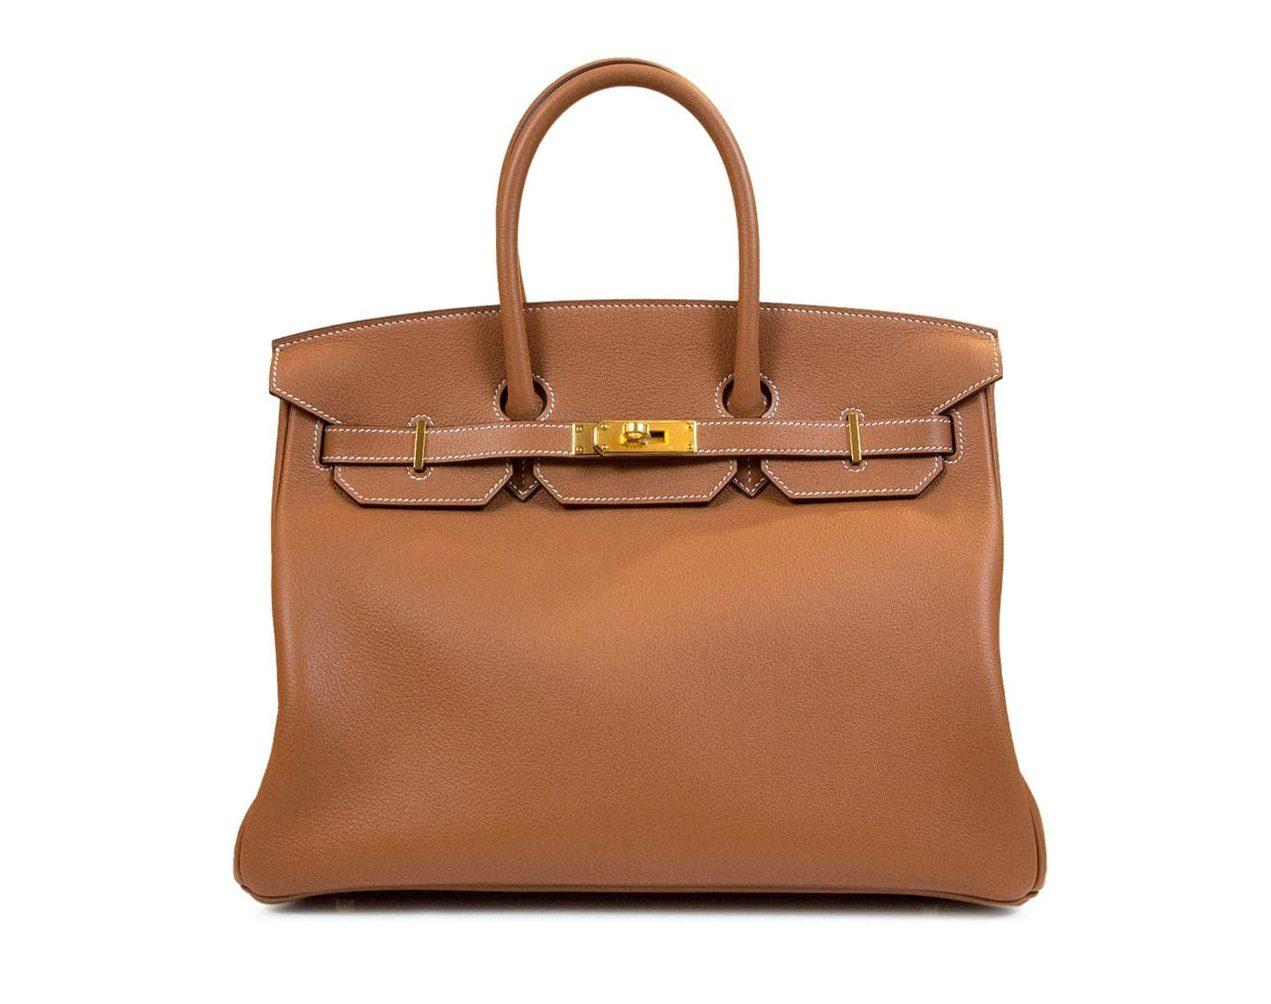 Bolso Birkin de Hermès/Farfetch.